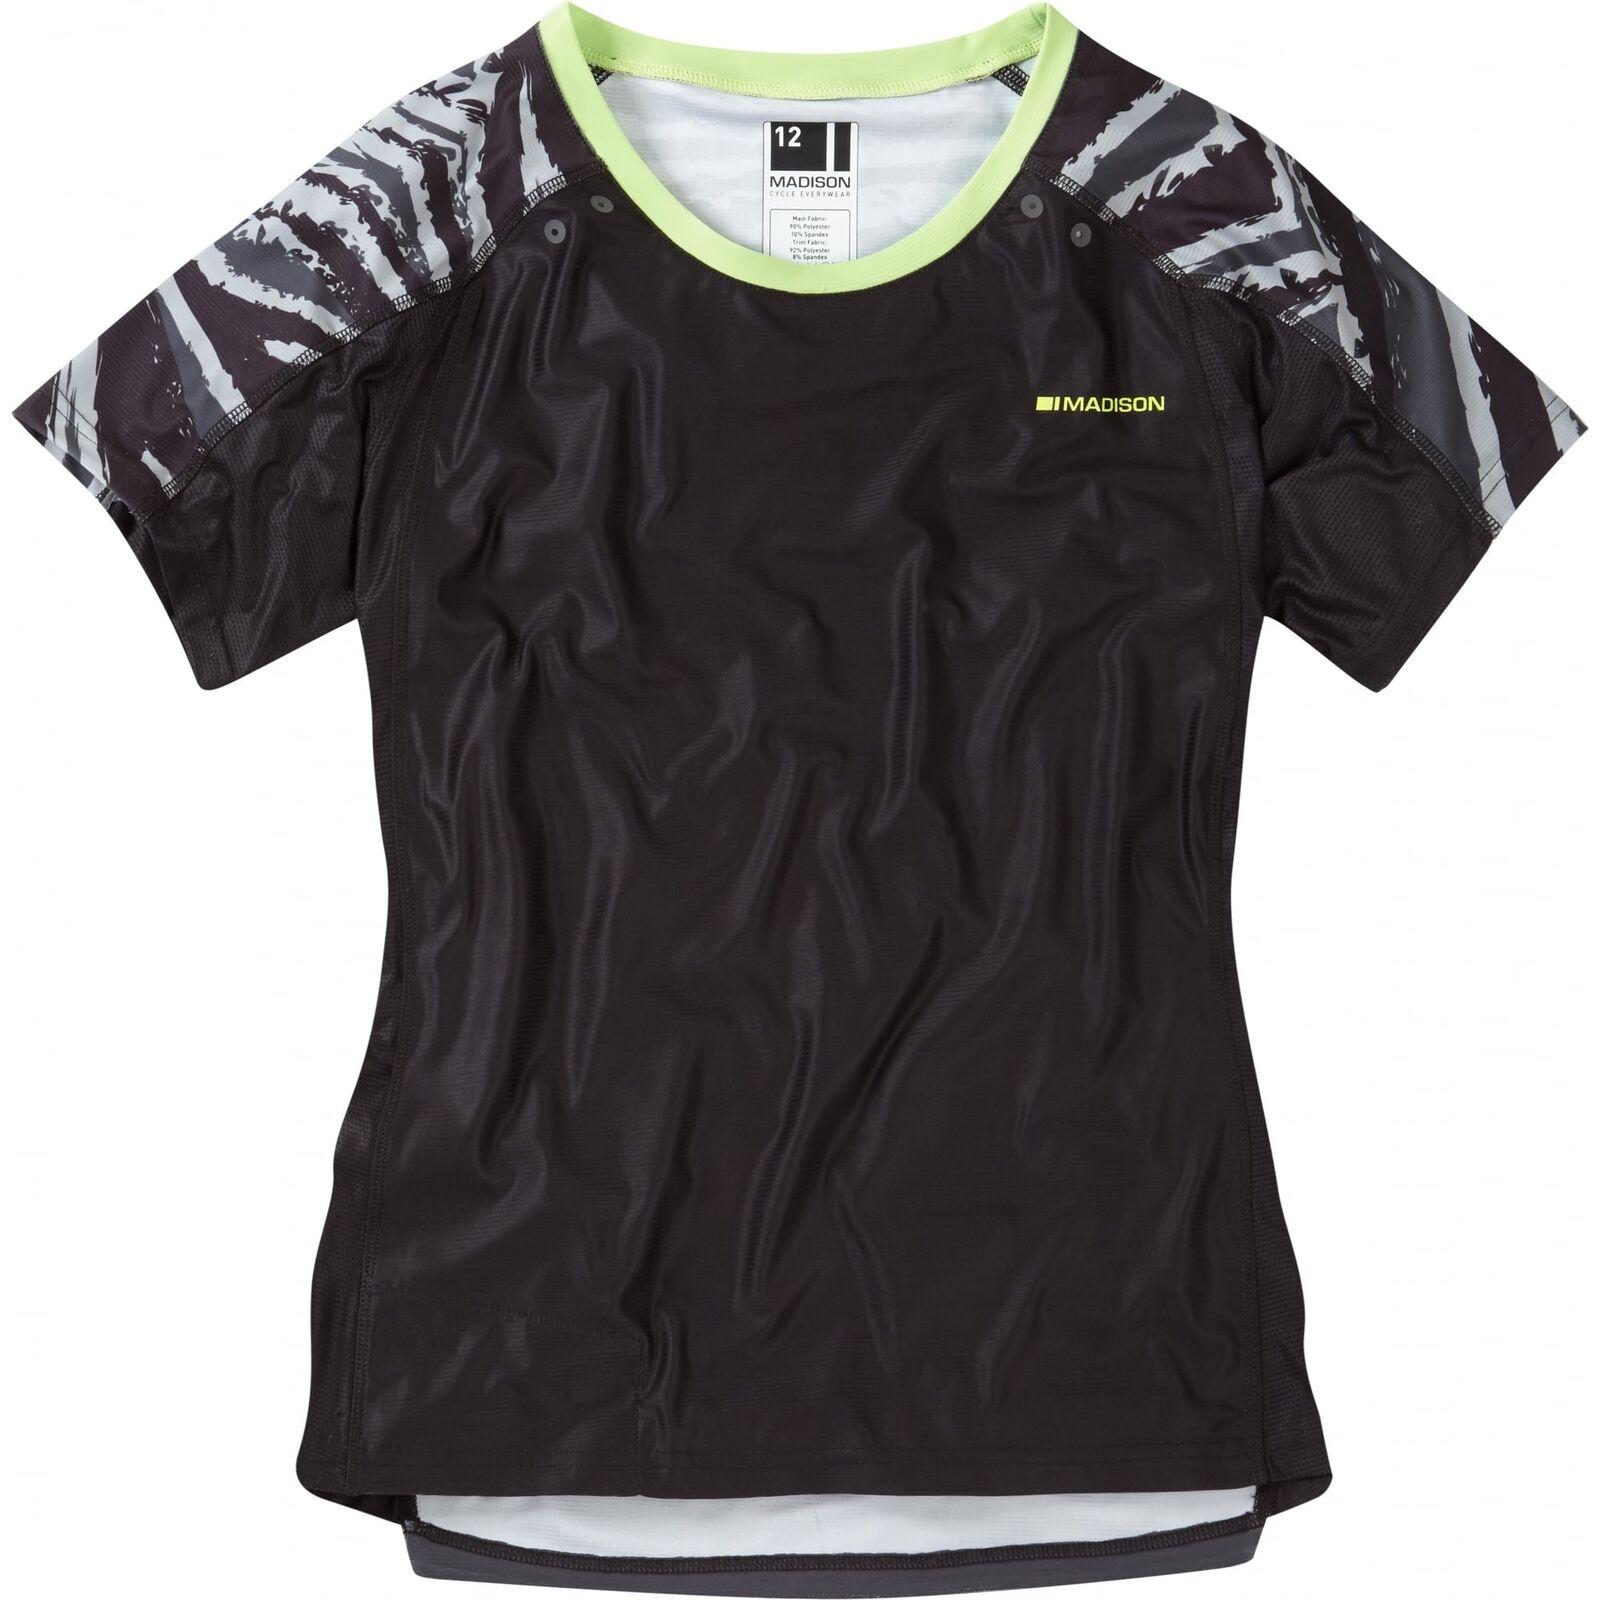 Madison Flux Enduro Women's Short Sleeve Jersey